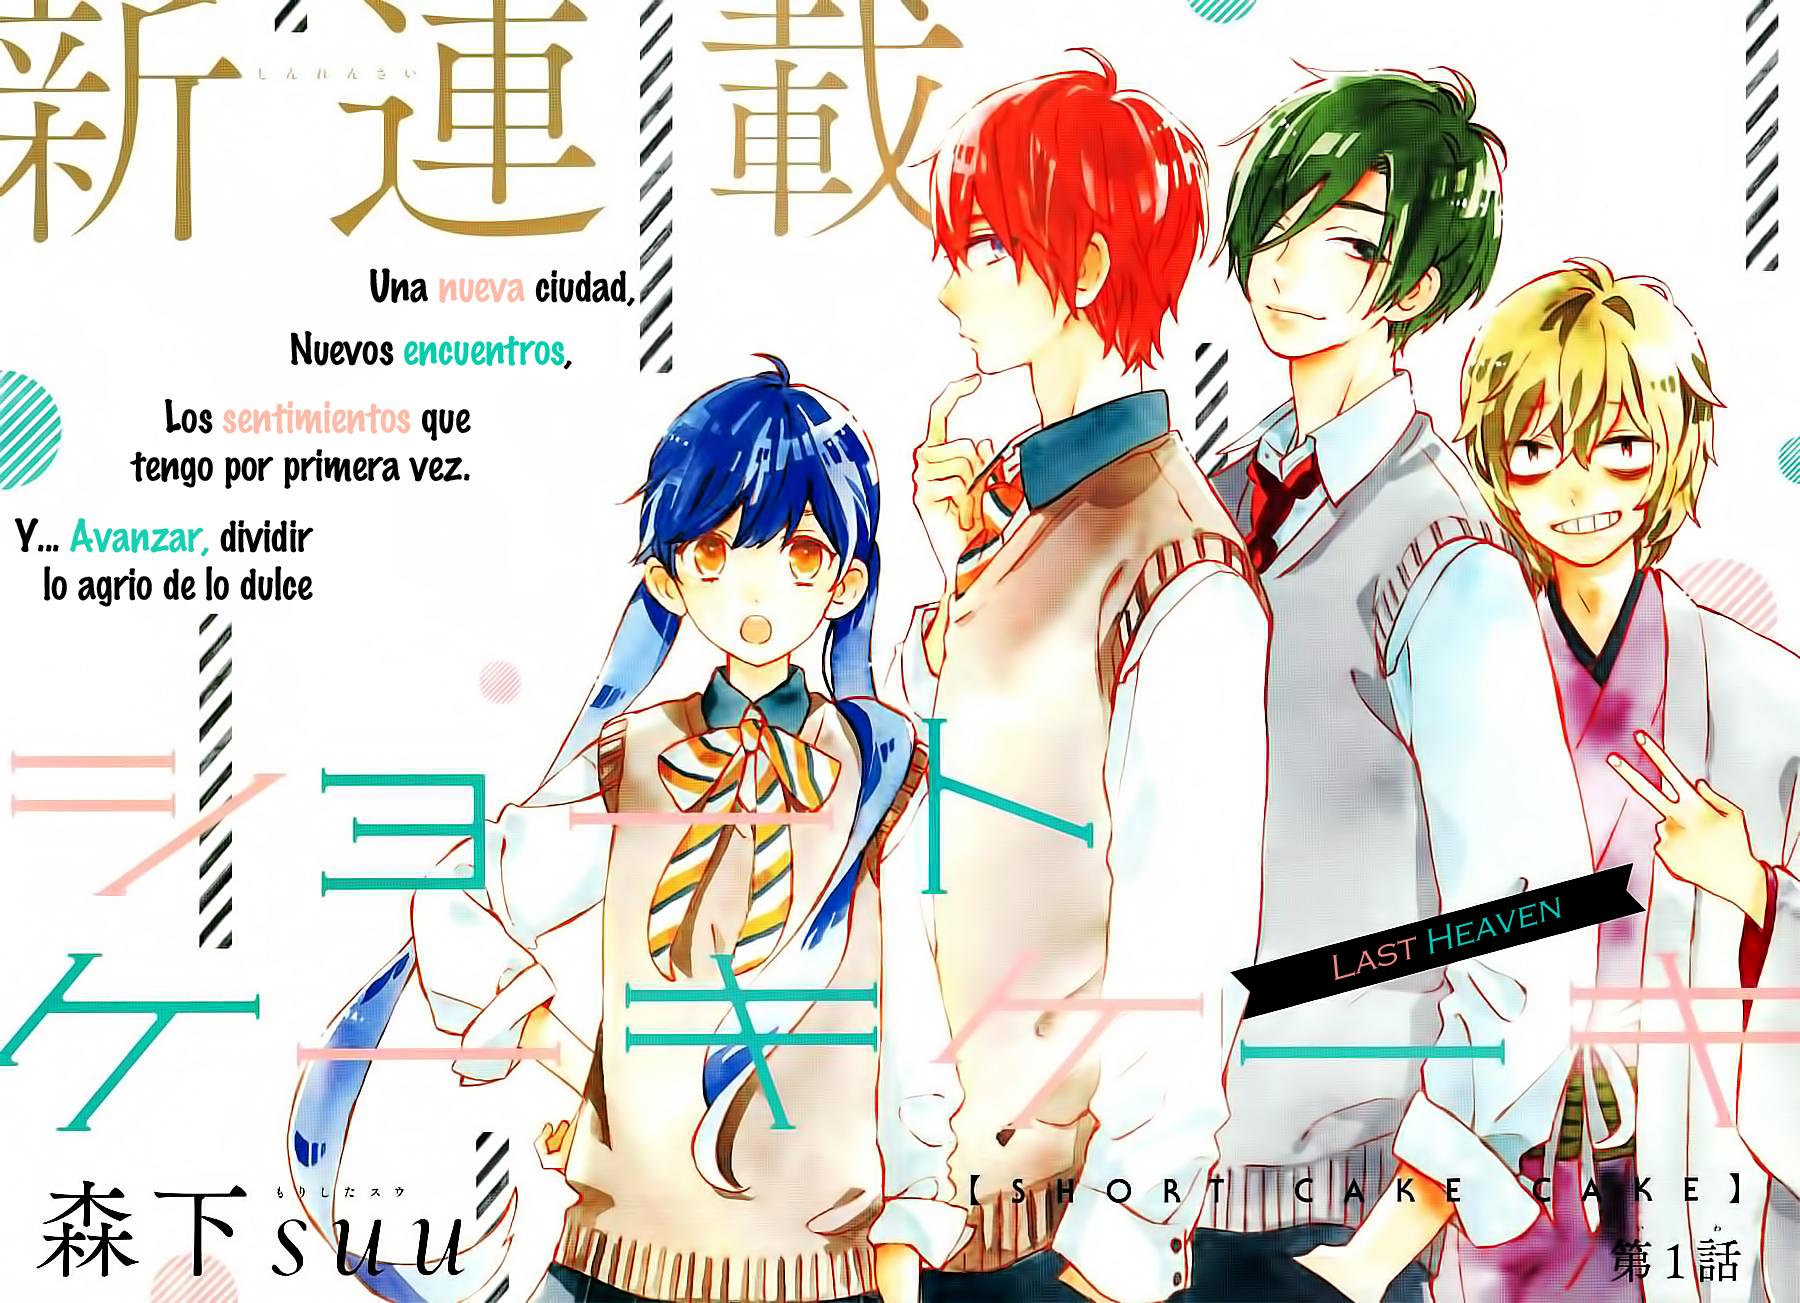 http://c5.ninemanga.com/es_manga/19/18451/431396/09765ccd8bc43e4778ad91d76f020e15.jpg Page 3